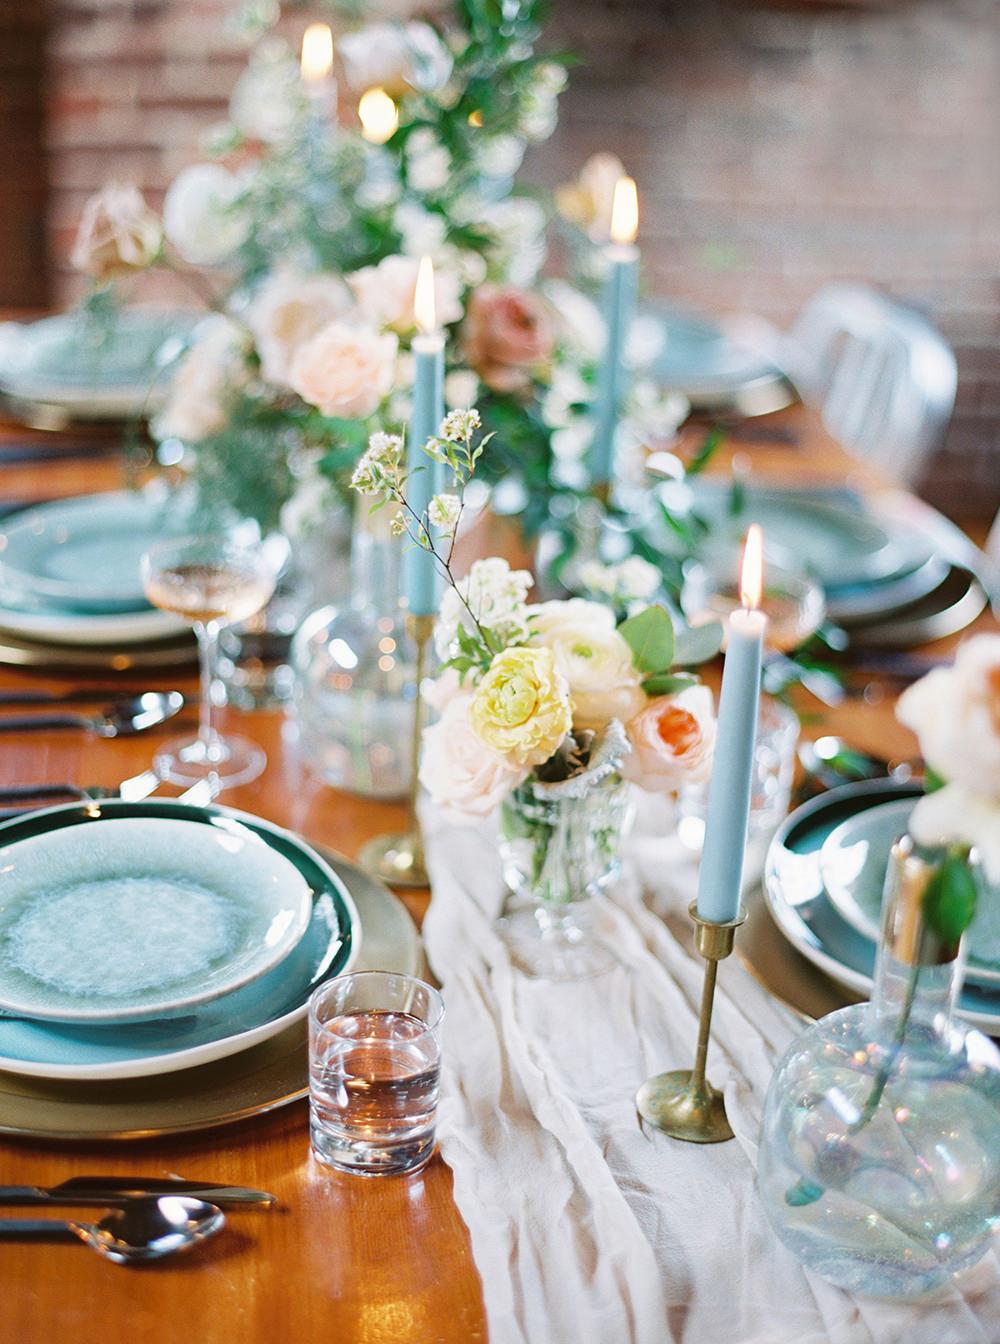 wedding tablescapes - photo by Photos by Heart http://ruffledblog.com/downtown-birmingham-spring-wedding-inspiration